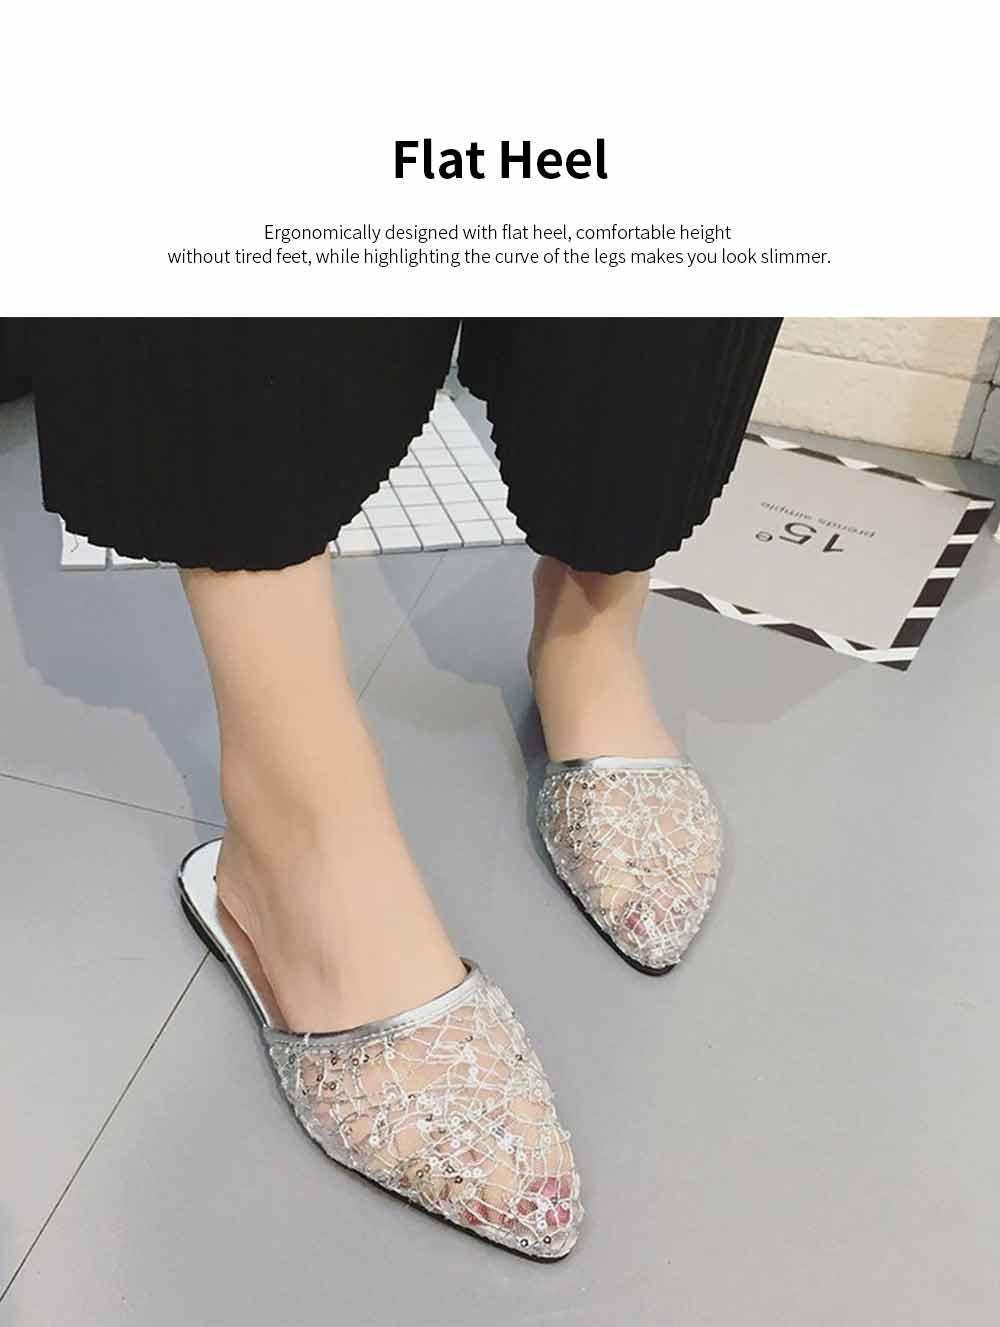 Women Slipper Pointed Toe Slides Flat Heels Backless Dress Sandals Hollow Out Flat Shoe 4